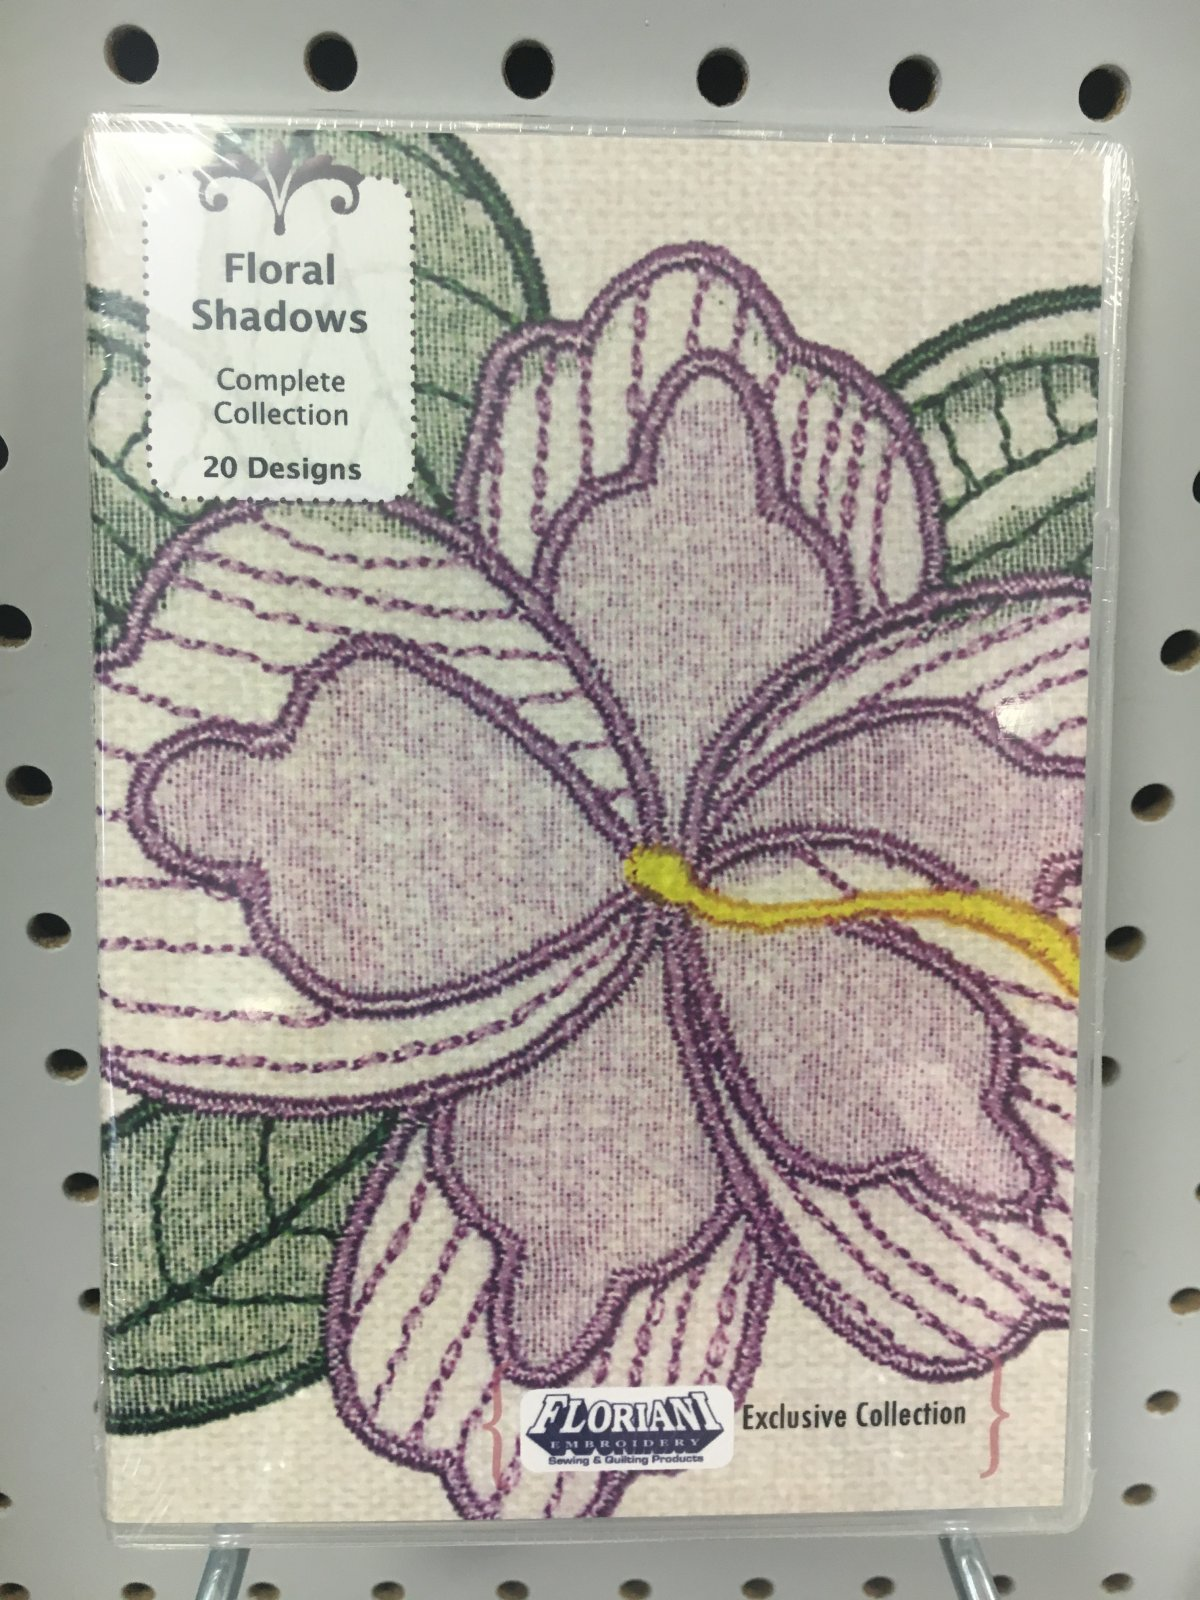 FLORIANI FLORAL SHADOWS